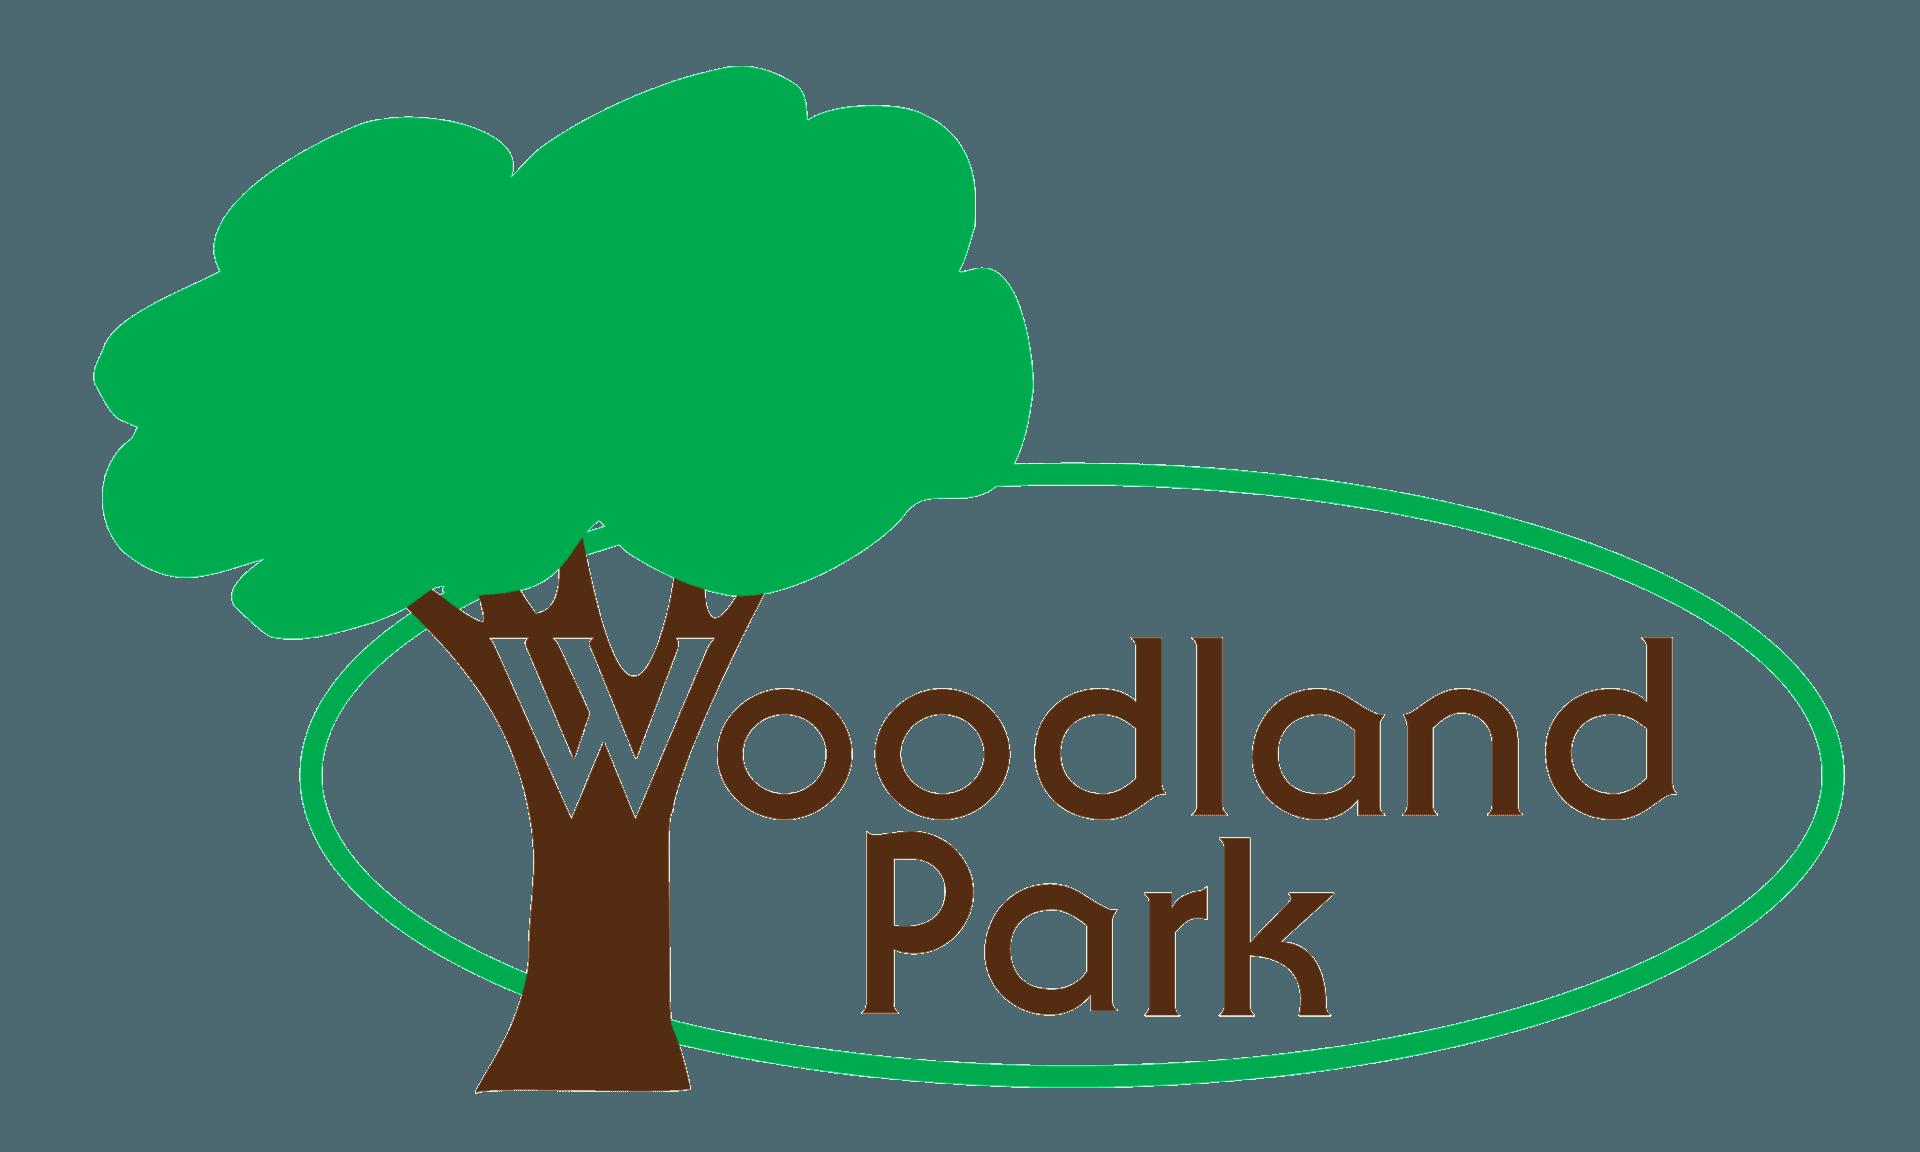 Woodland clipart leaf. News park